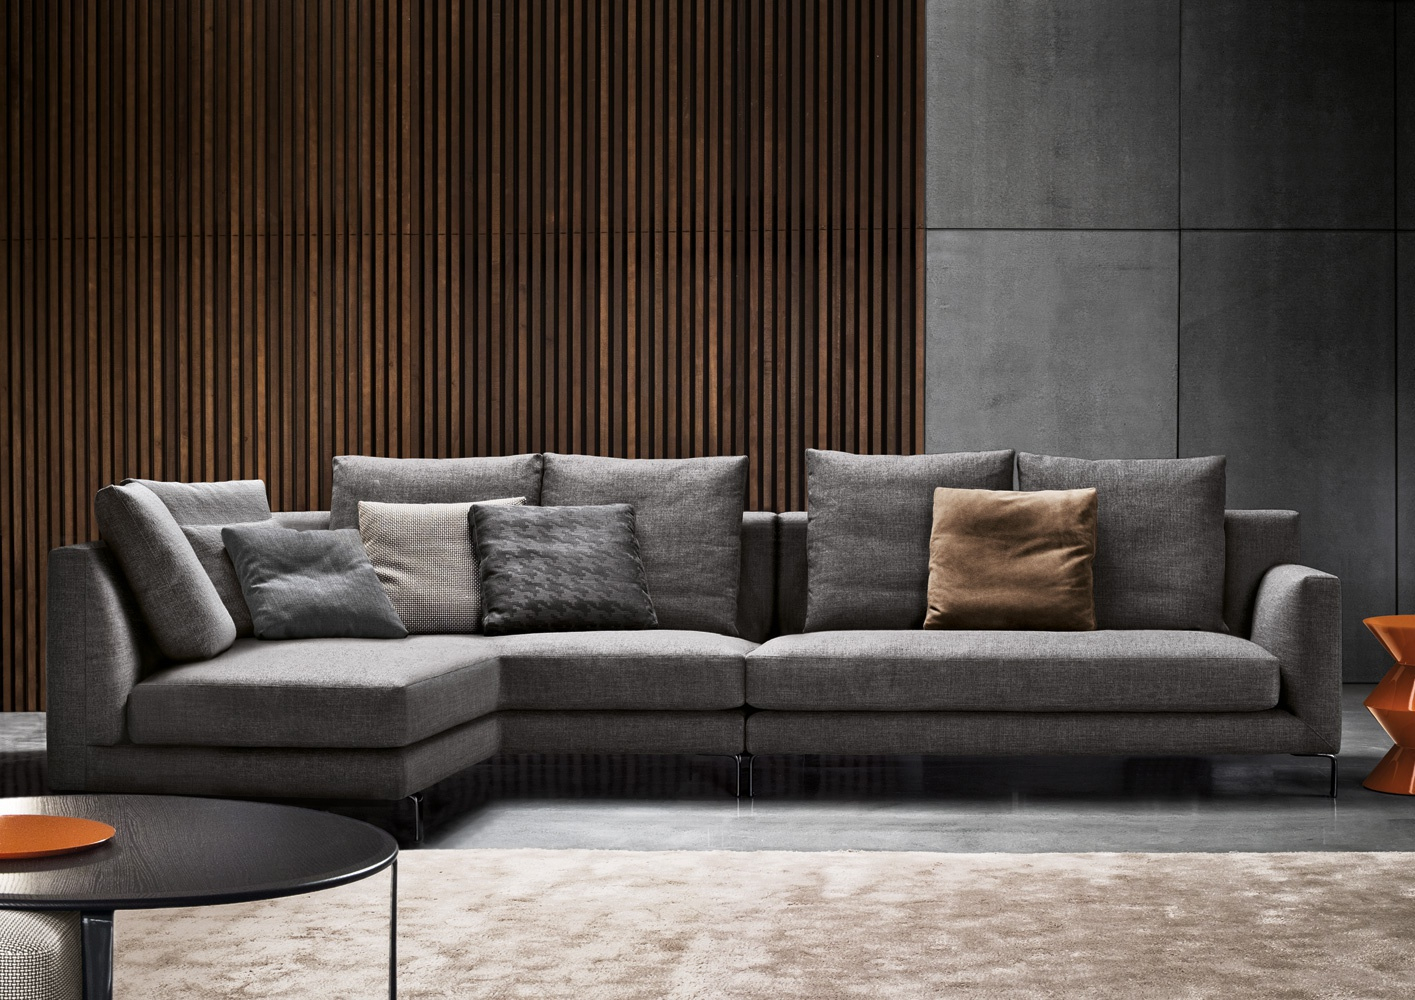 Modular Sofa Allen Minotti - Luxury Furniture Mr avec Sofa